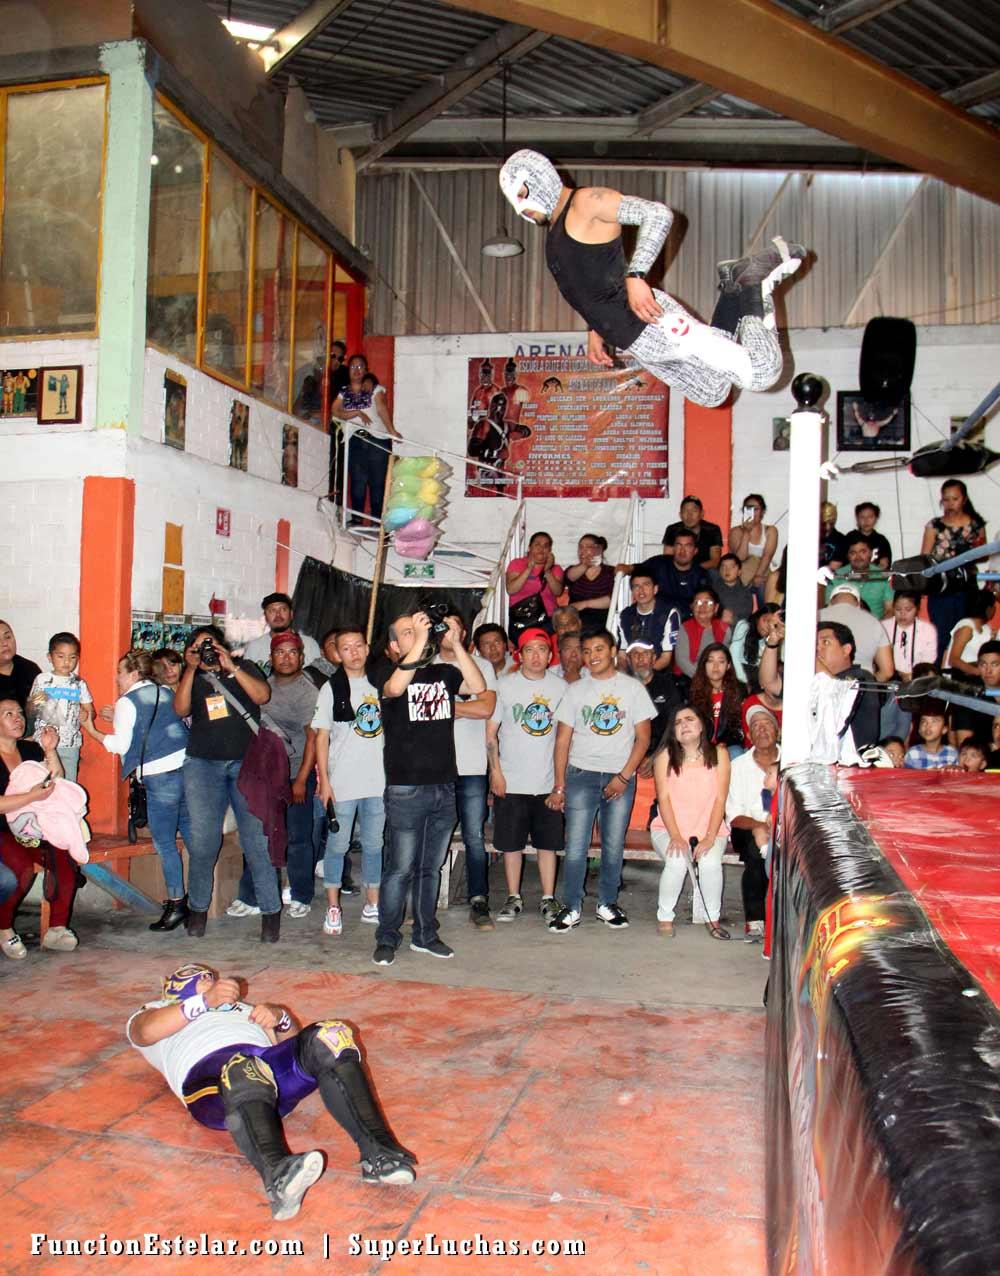 Lucha Libre Vanguardia